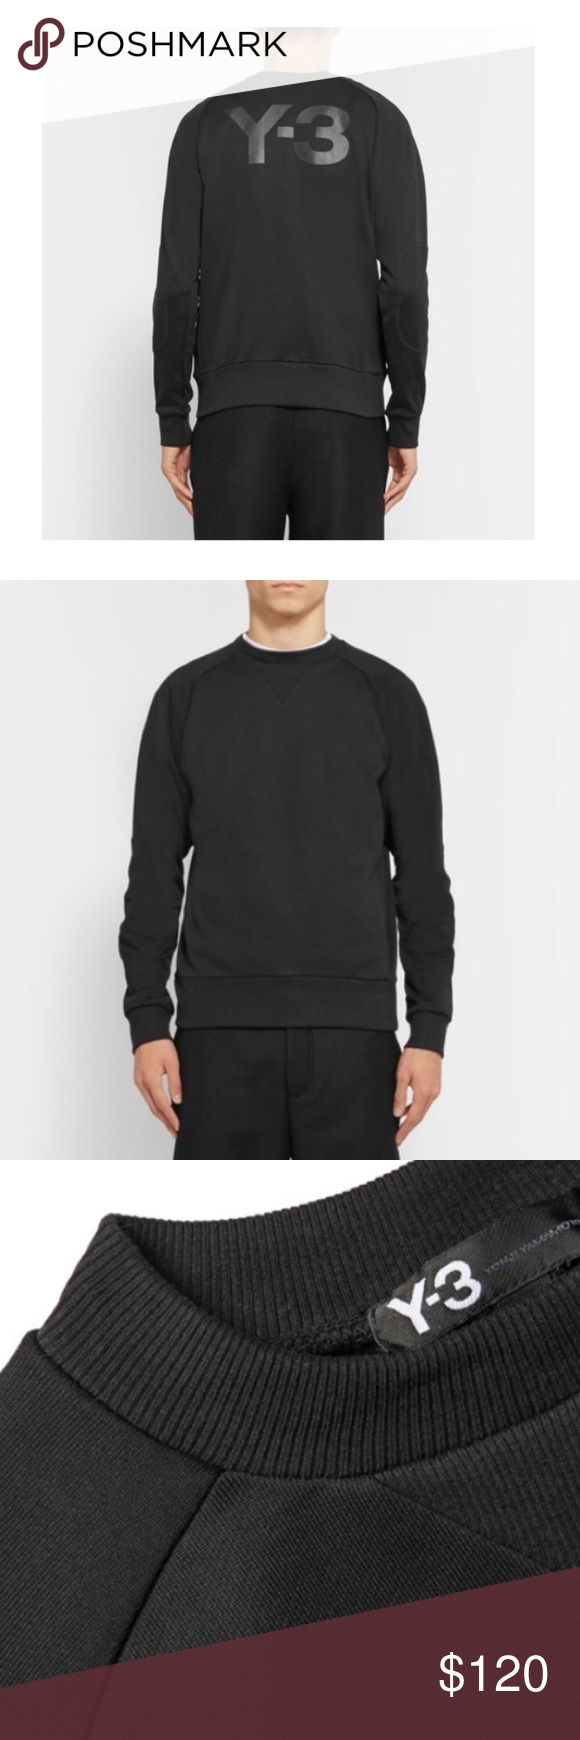 Yohji Yamamoto Y3 + Adidas Crewneck Black Y3 Logo Crewneck (size XXL but fits like a large) Y3 Sweaters Crewneck